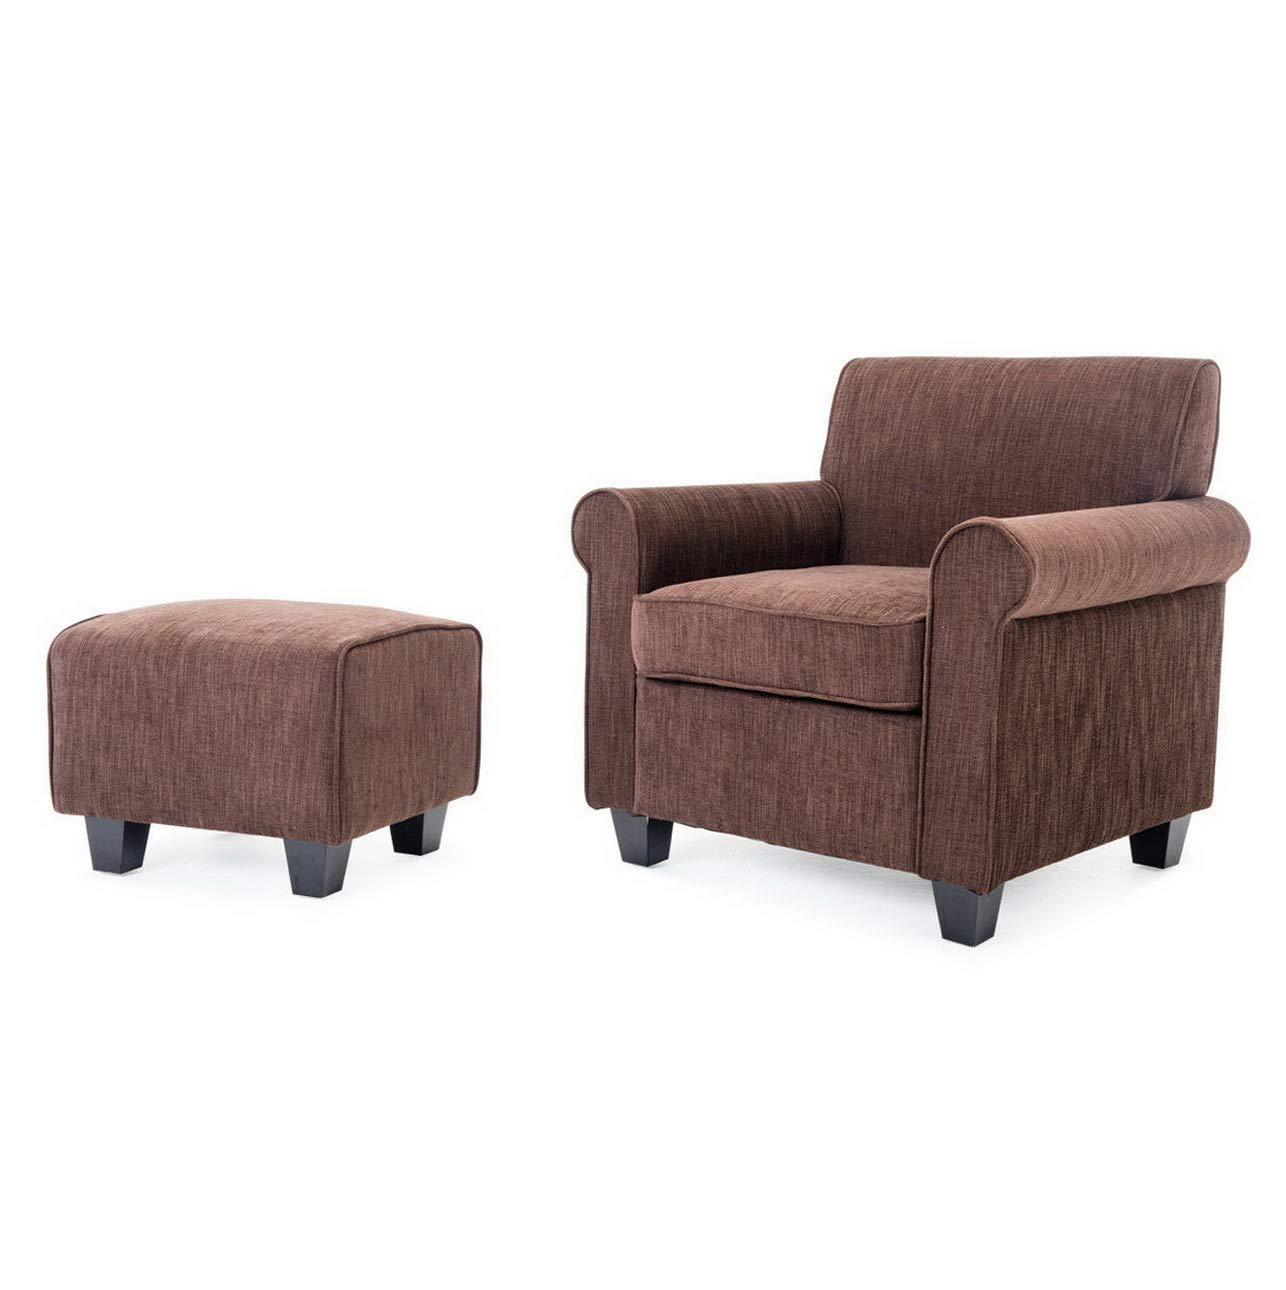 Amazon.com: Hebel Retro Chairs Ottoman Upholstered Foam ...